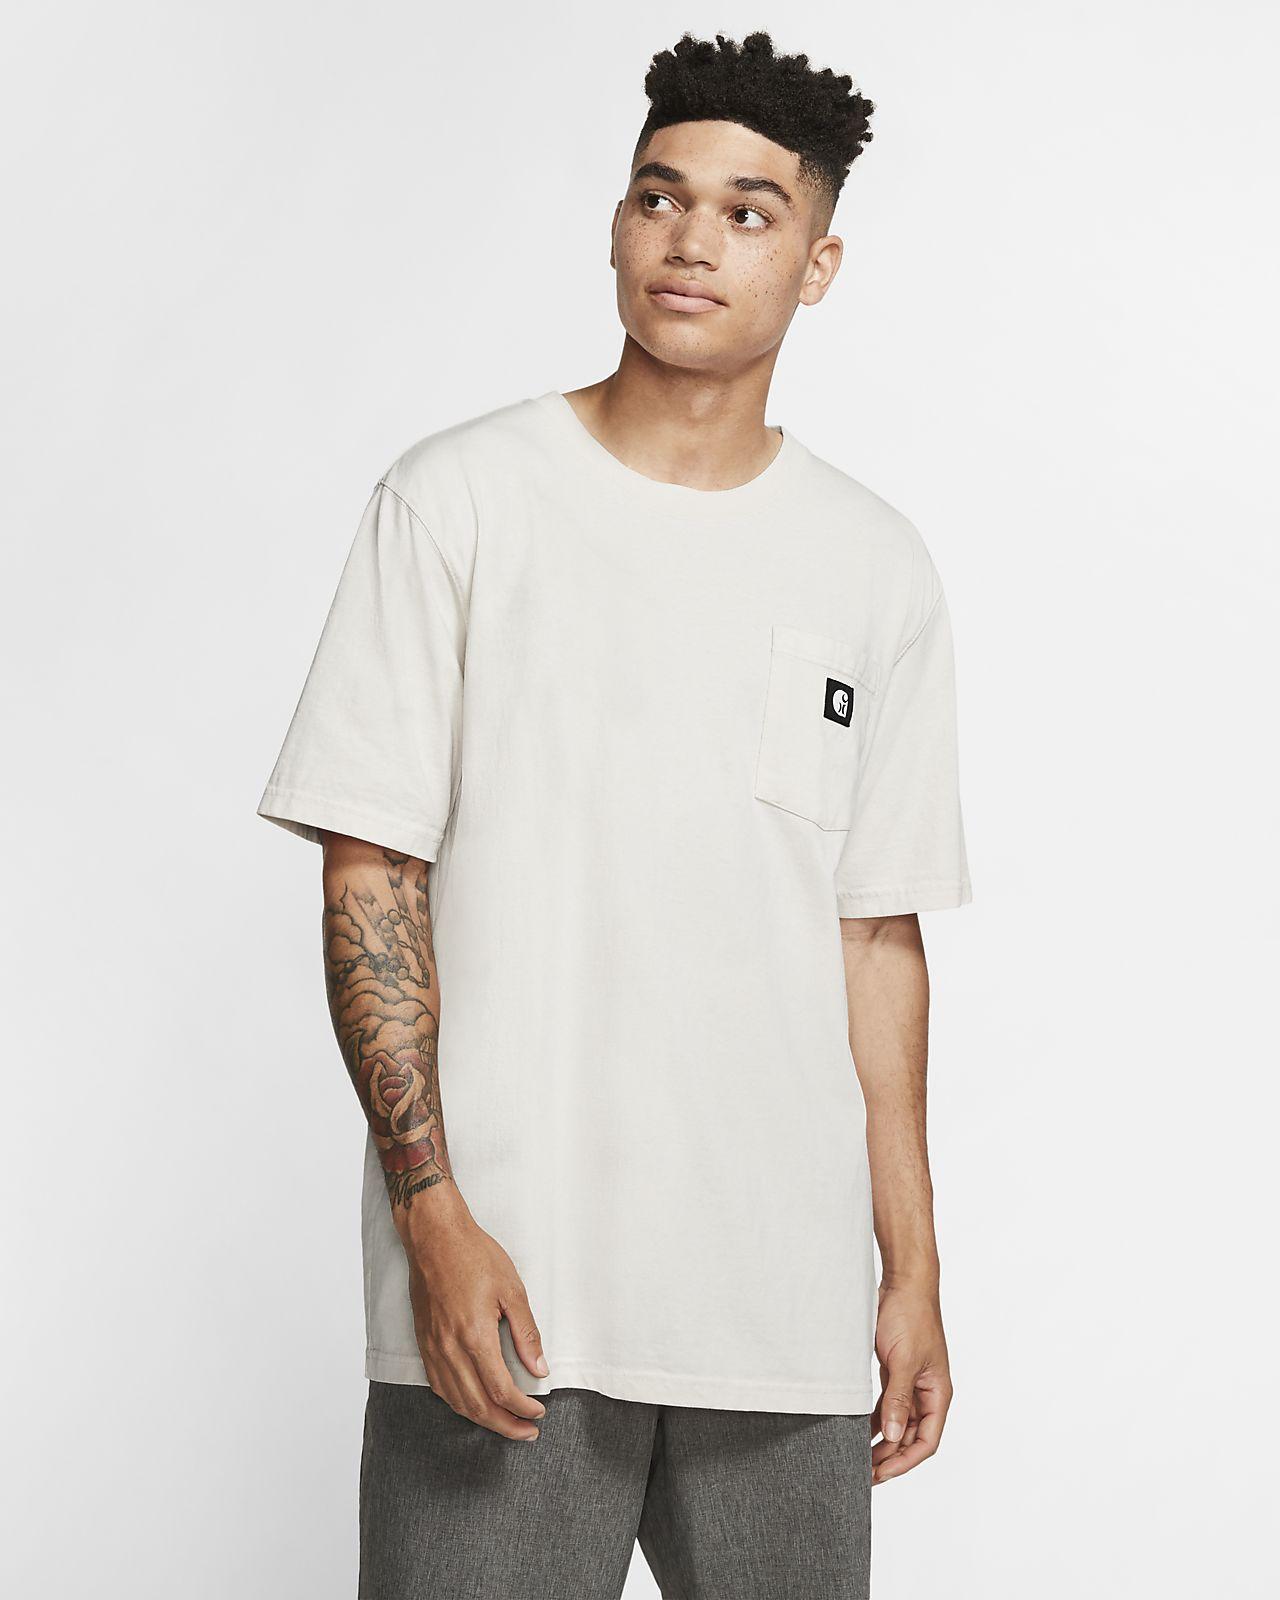 Hurley x Carhartt-T-shirt til mænd